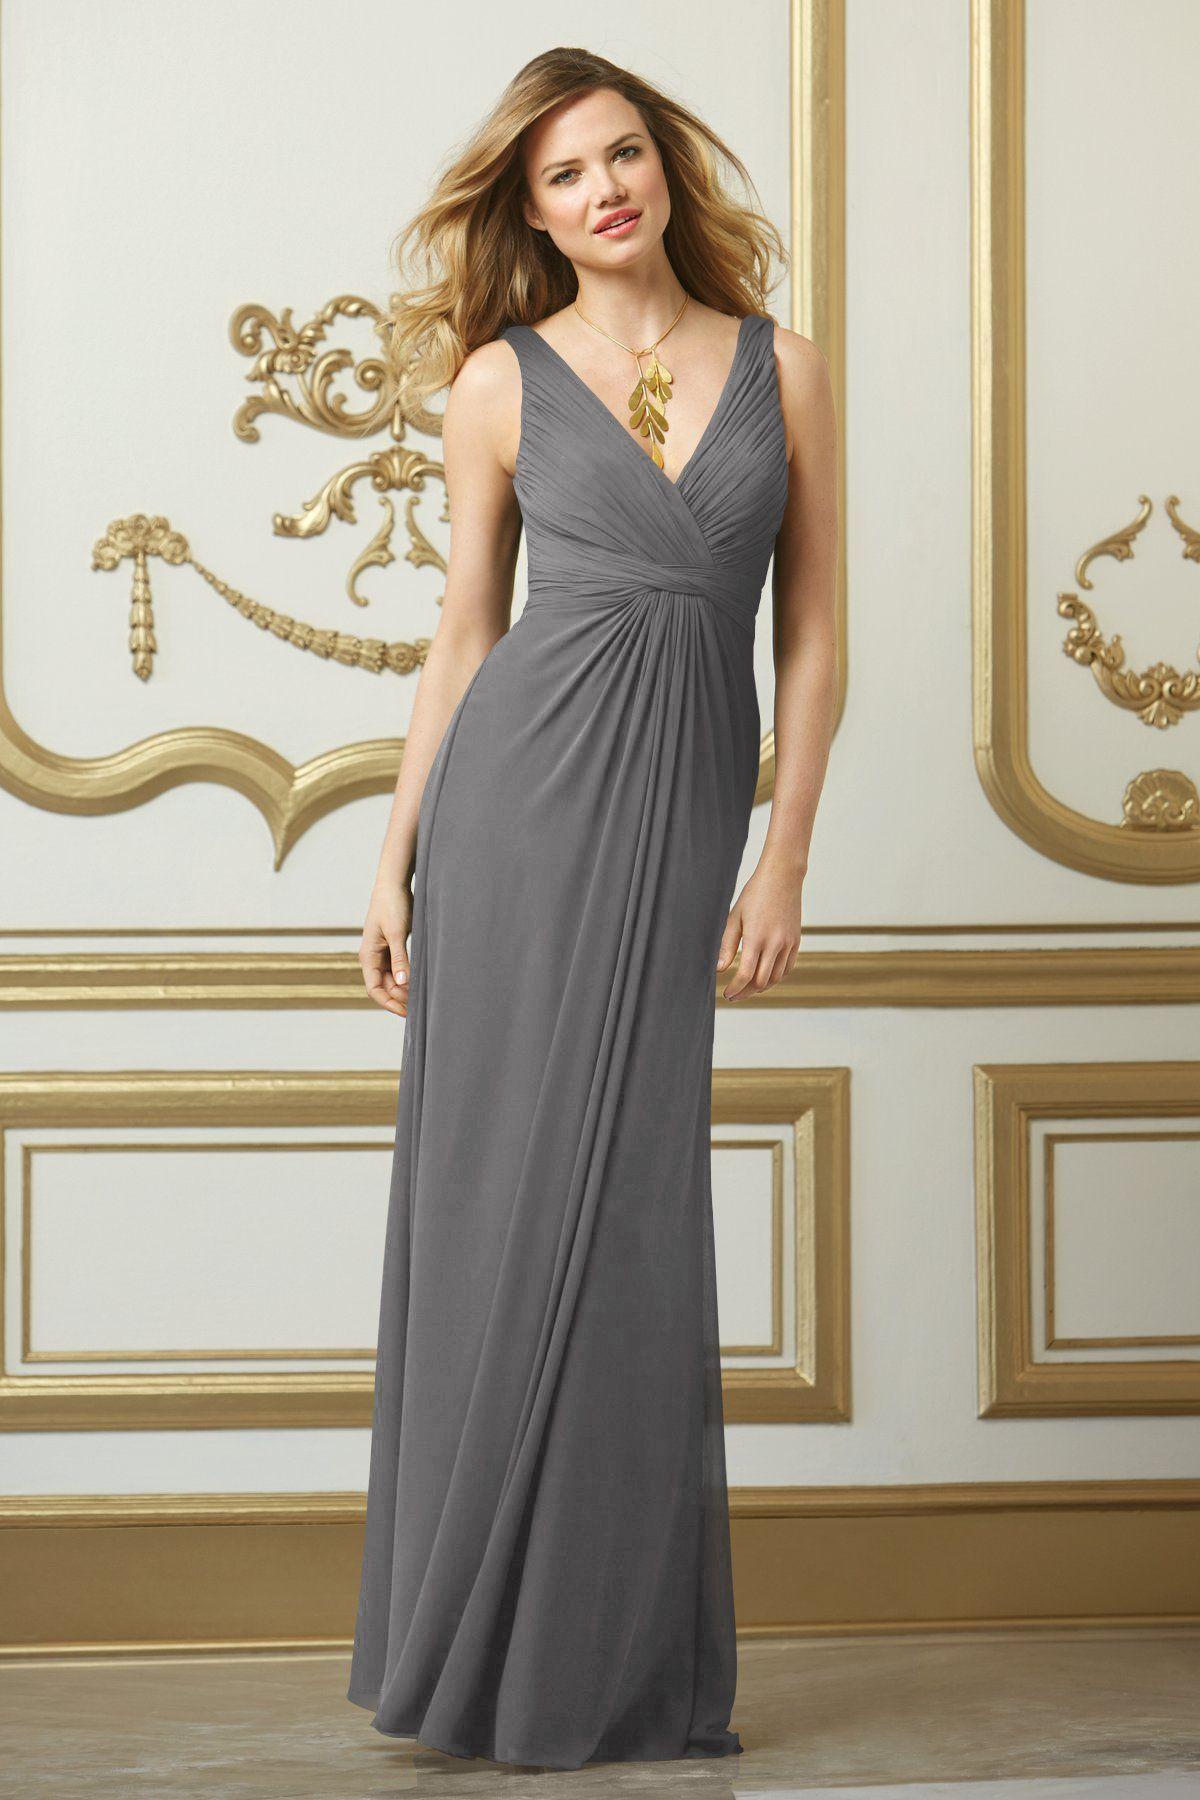 Pin by bianca harris on bridesmaids dress pinterest